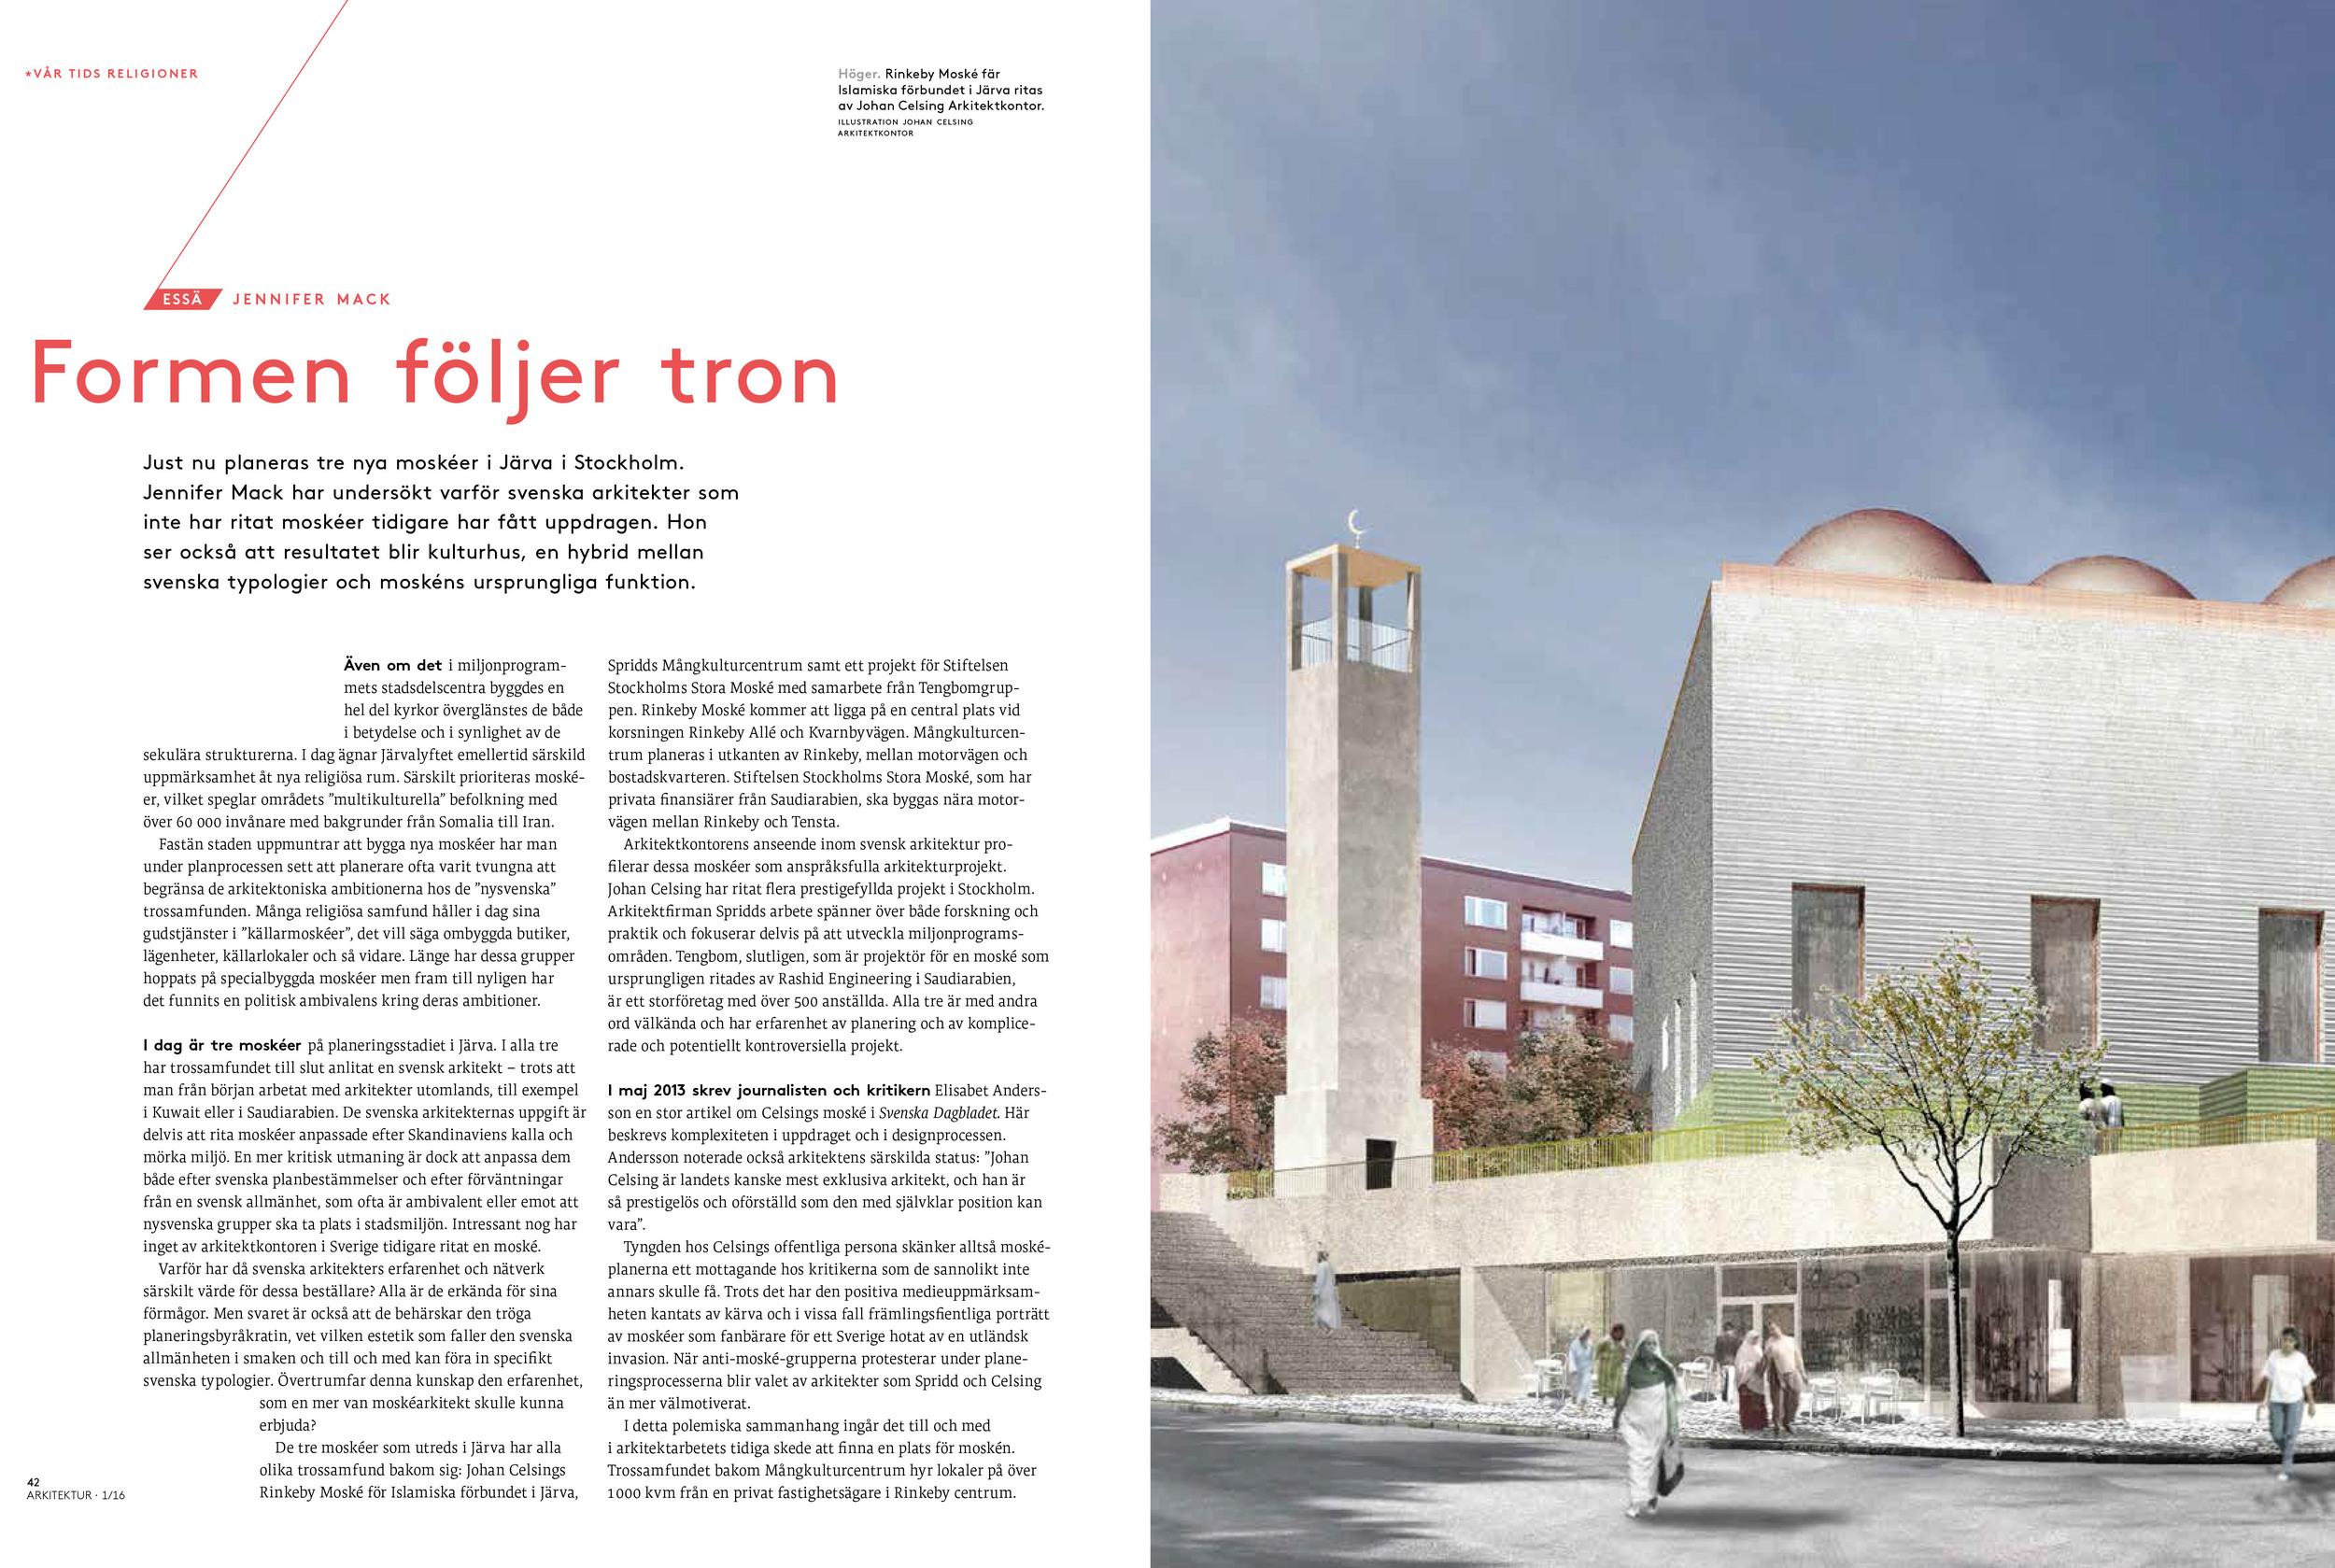 Arkitektur 01-2016_Mack_Formen fo?ljer tron-1.jpg